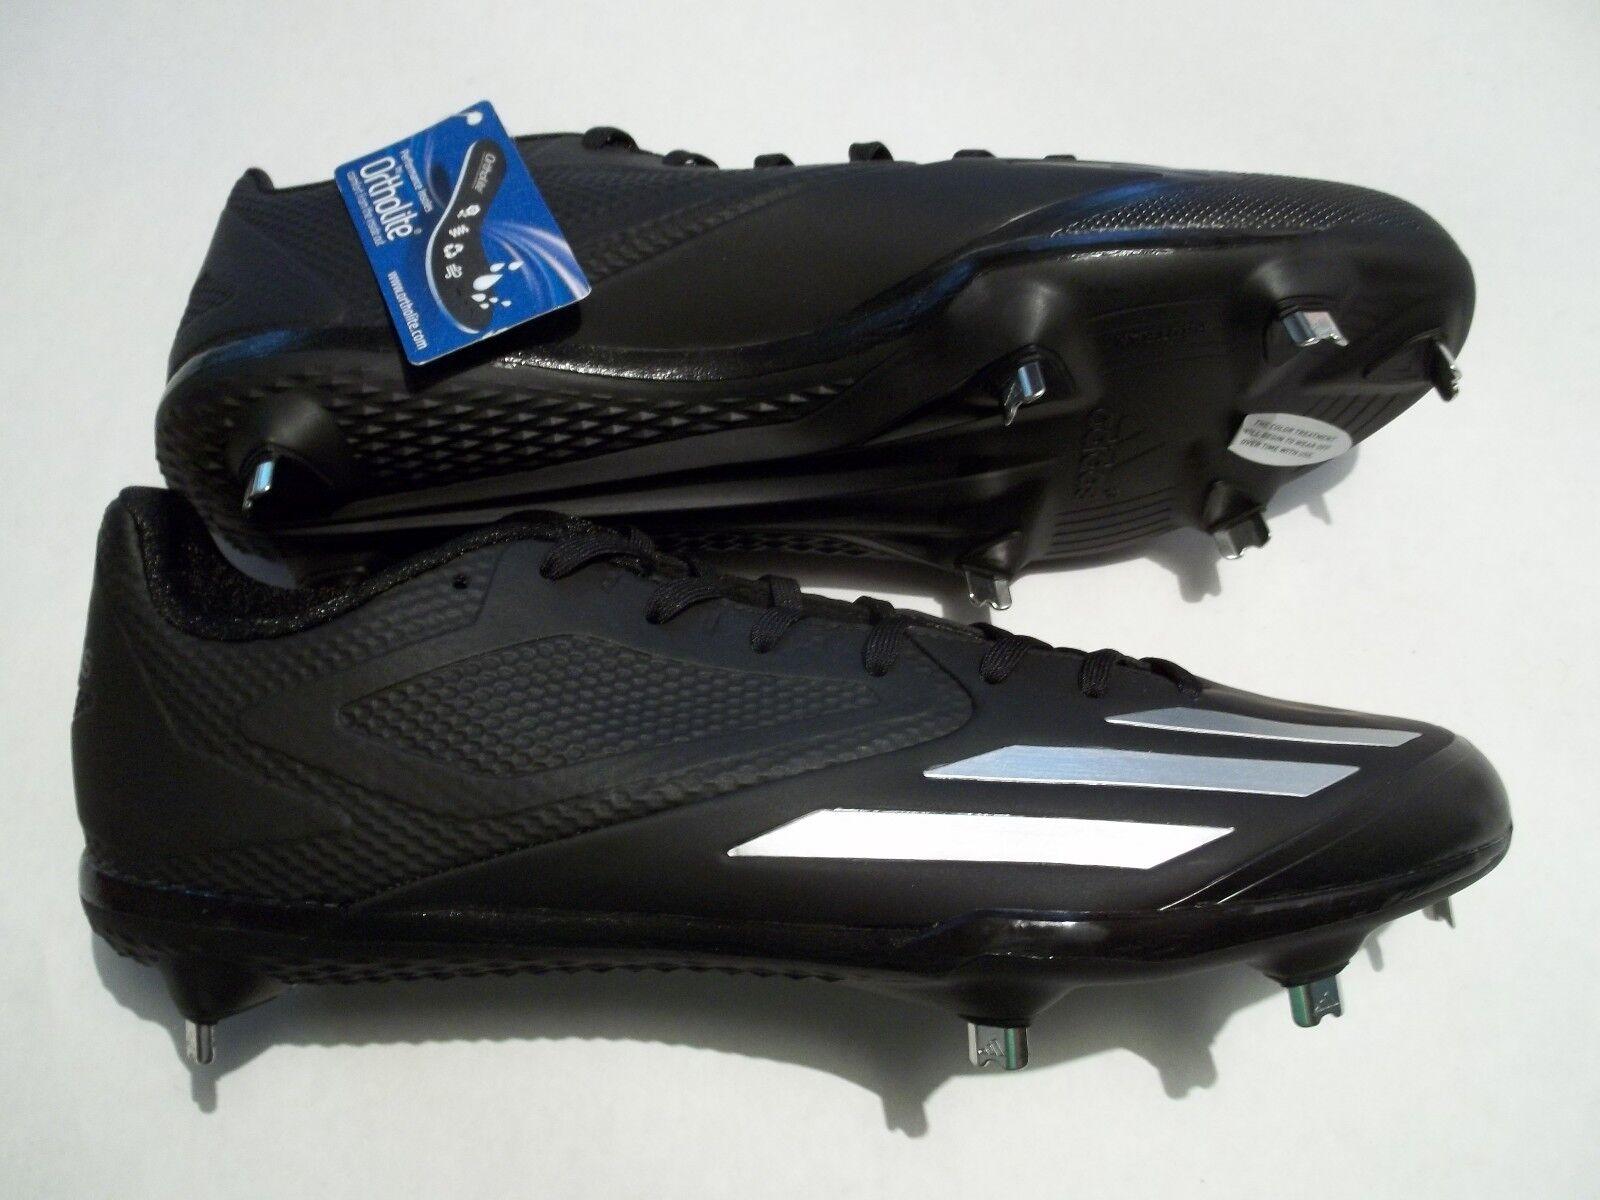 97e209c5f New Adidas Adizero Afterburner 3 Men s Size 13 Metal Baseball Cleats Q16563